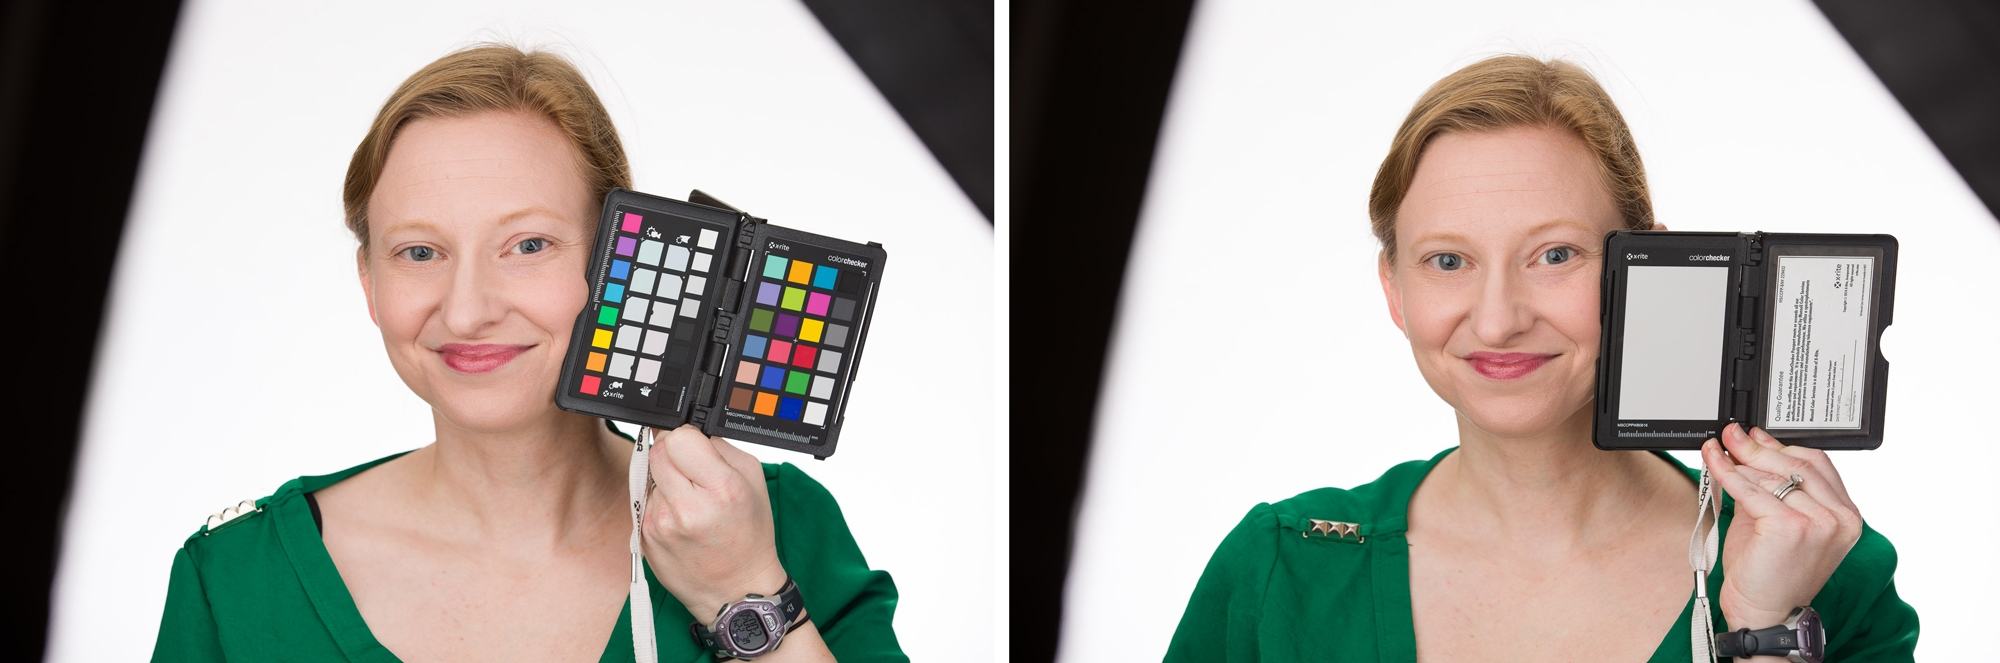 x-rite color checker demonstation